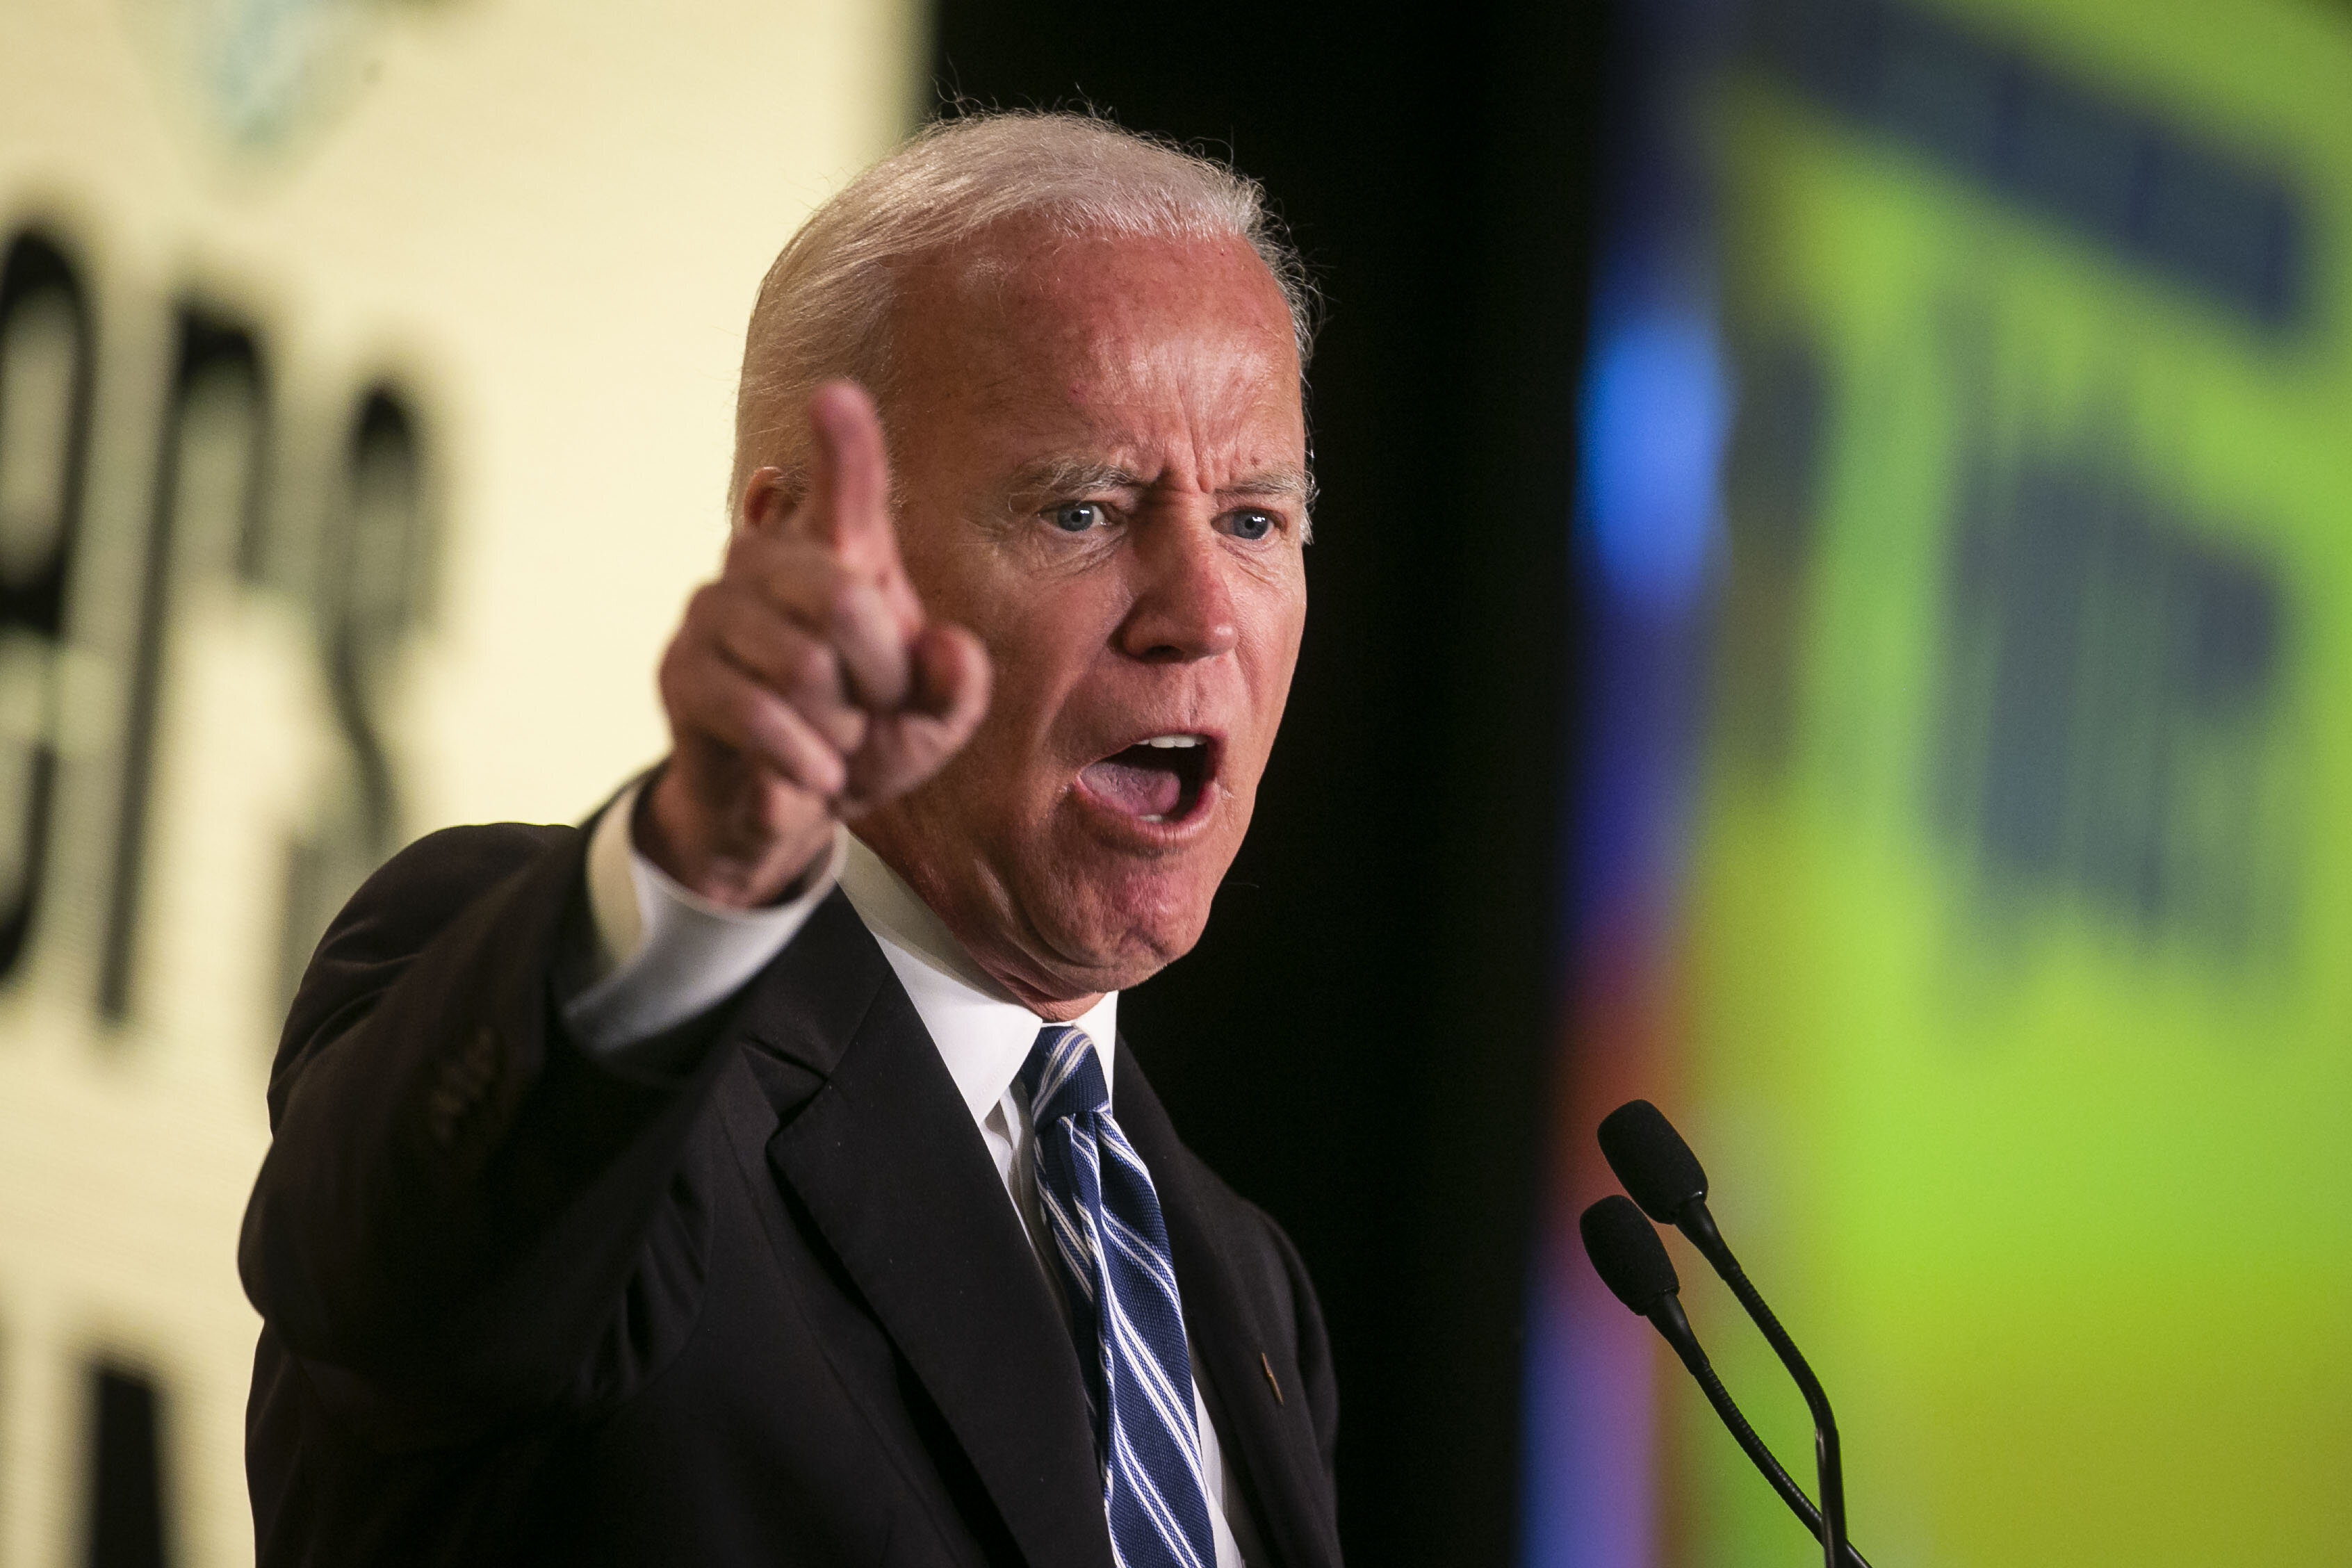 Joe Biden speaks at the International Association of Fire Fighters' legislative conference in March. The union endorsed Biden